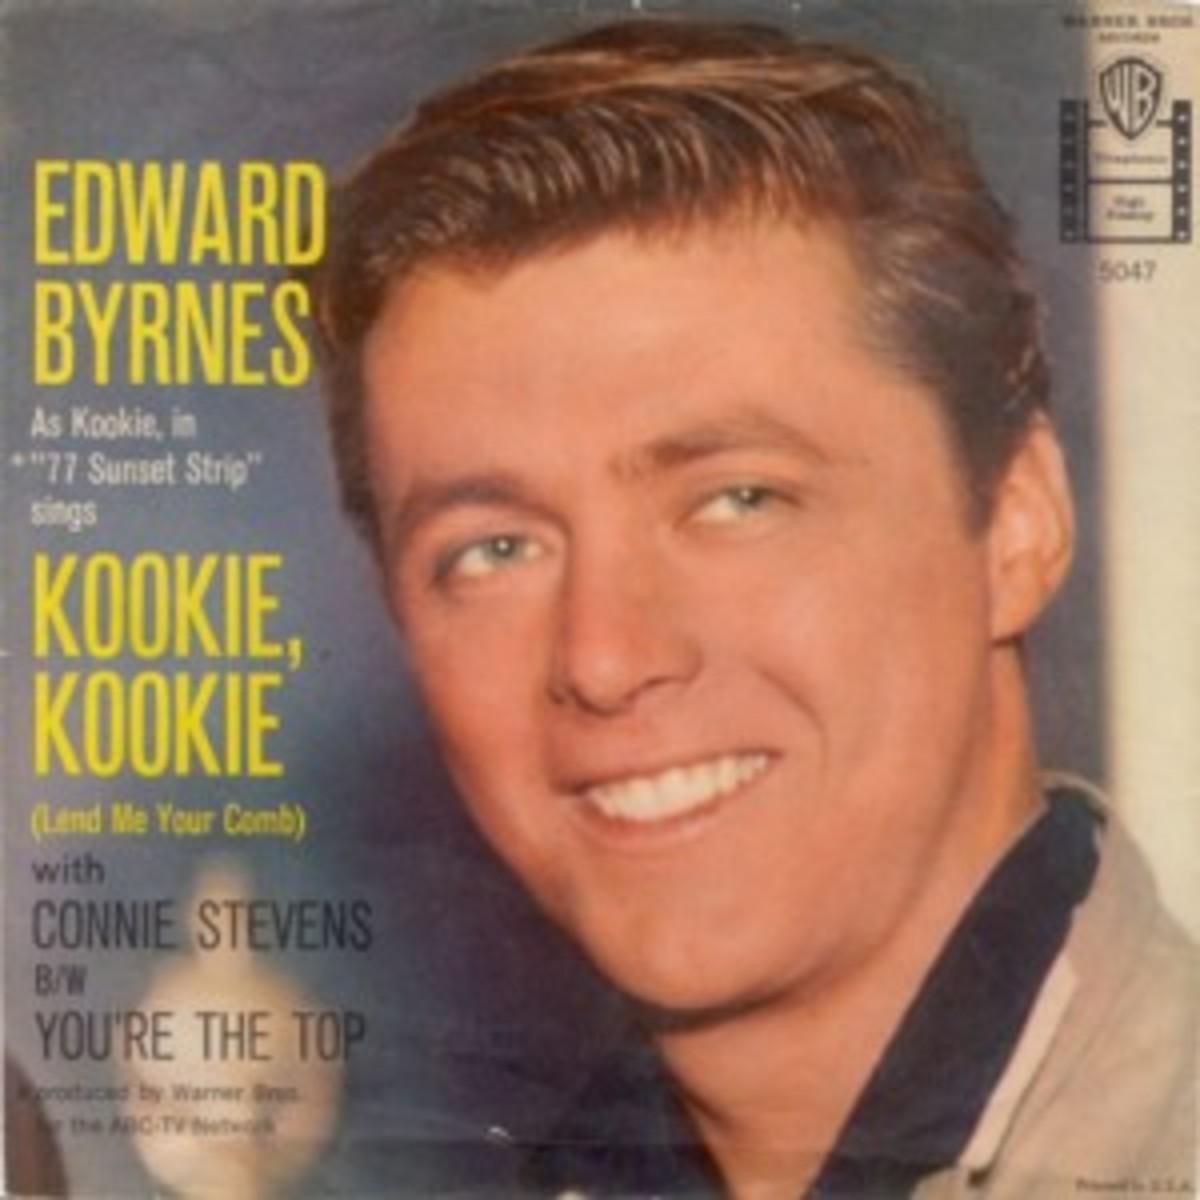 Edd Cookie Byrnes picture sleeve